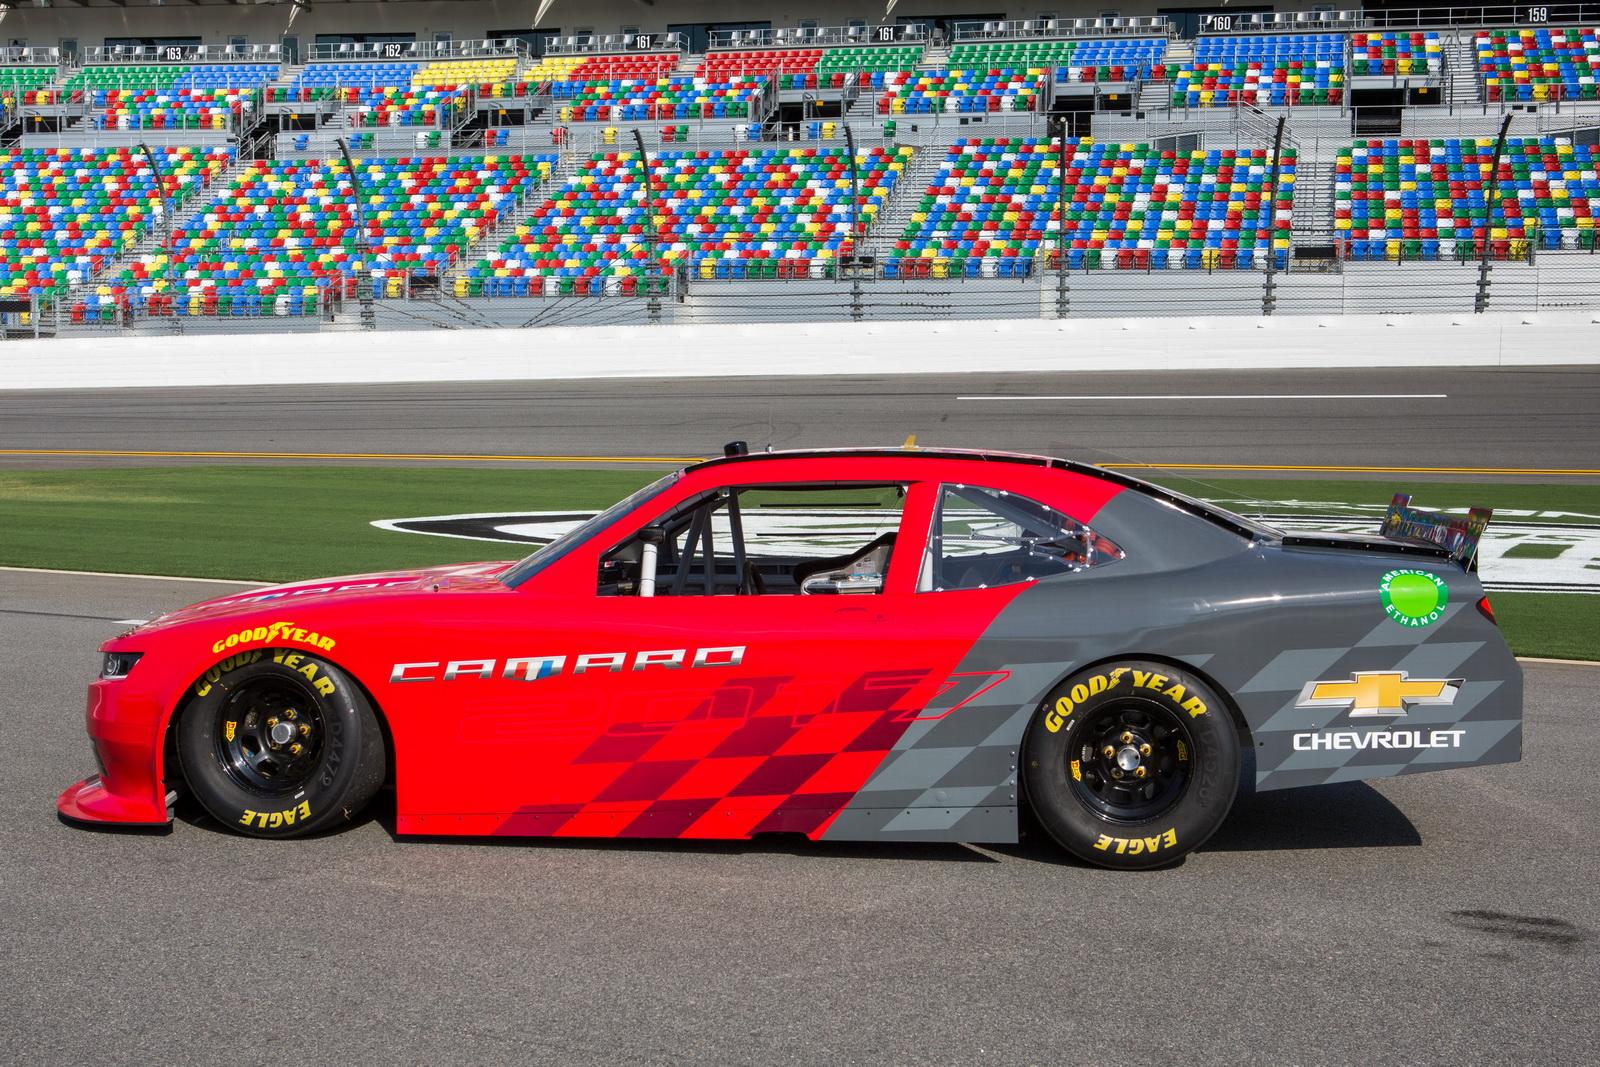 Chevrolet Camaro 2017 (NASCAR Xfinity Series)